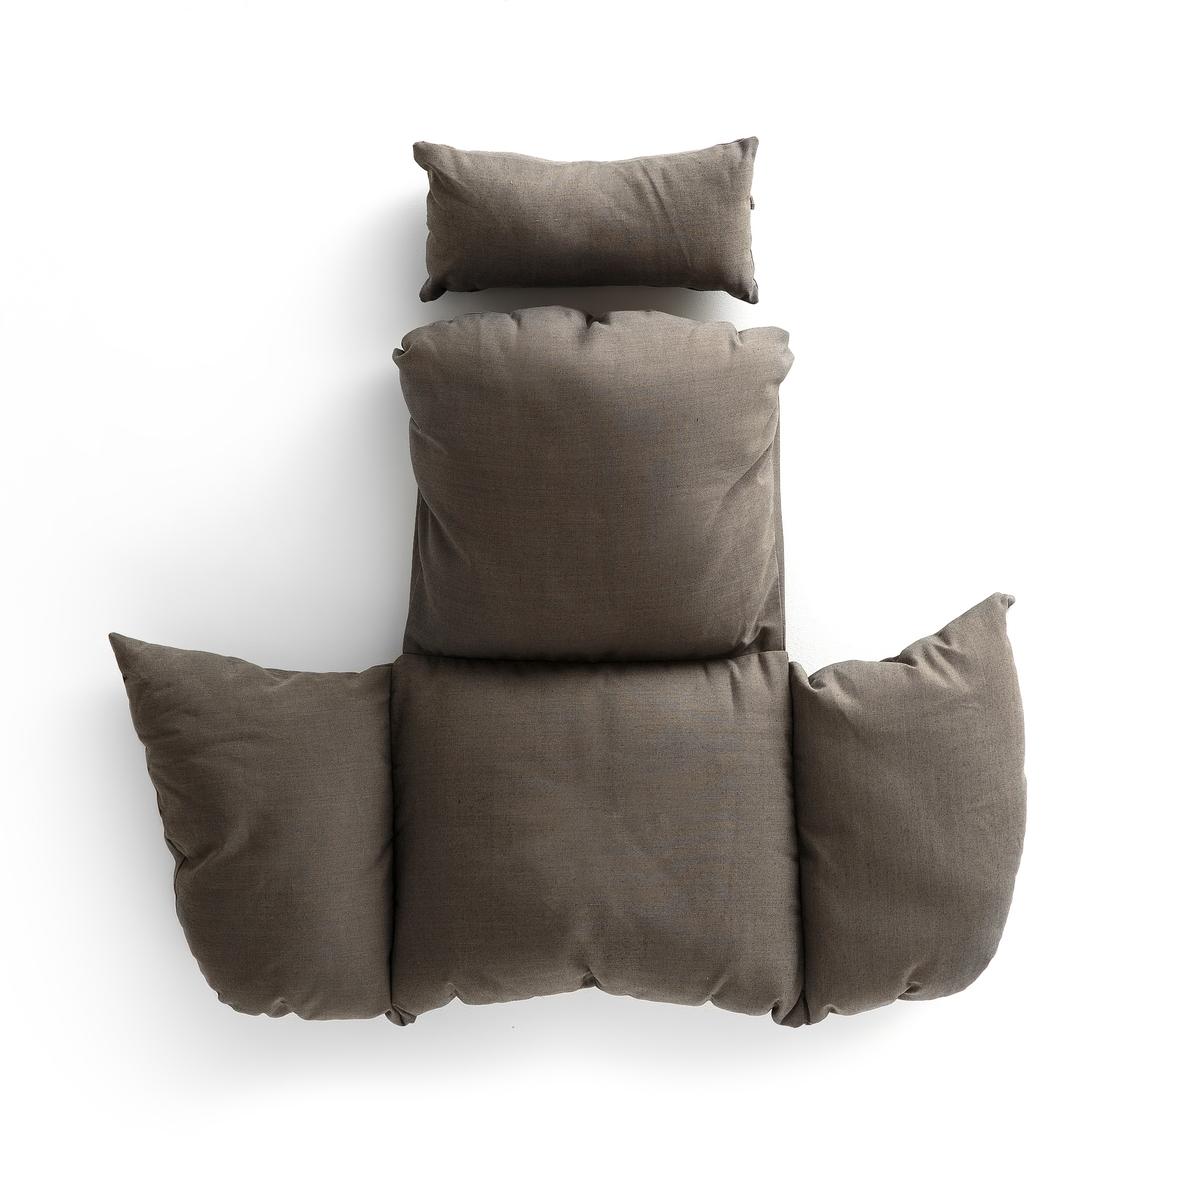 Подушка для подвесного кресла, Bosseda